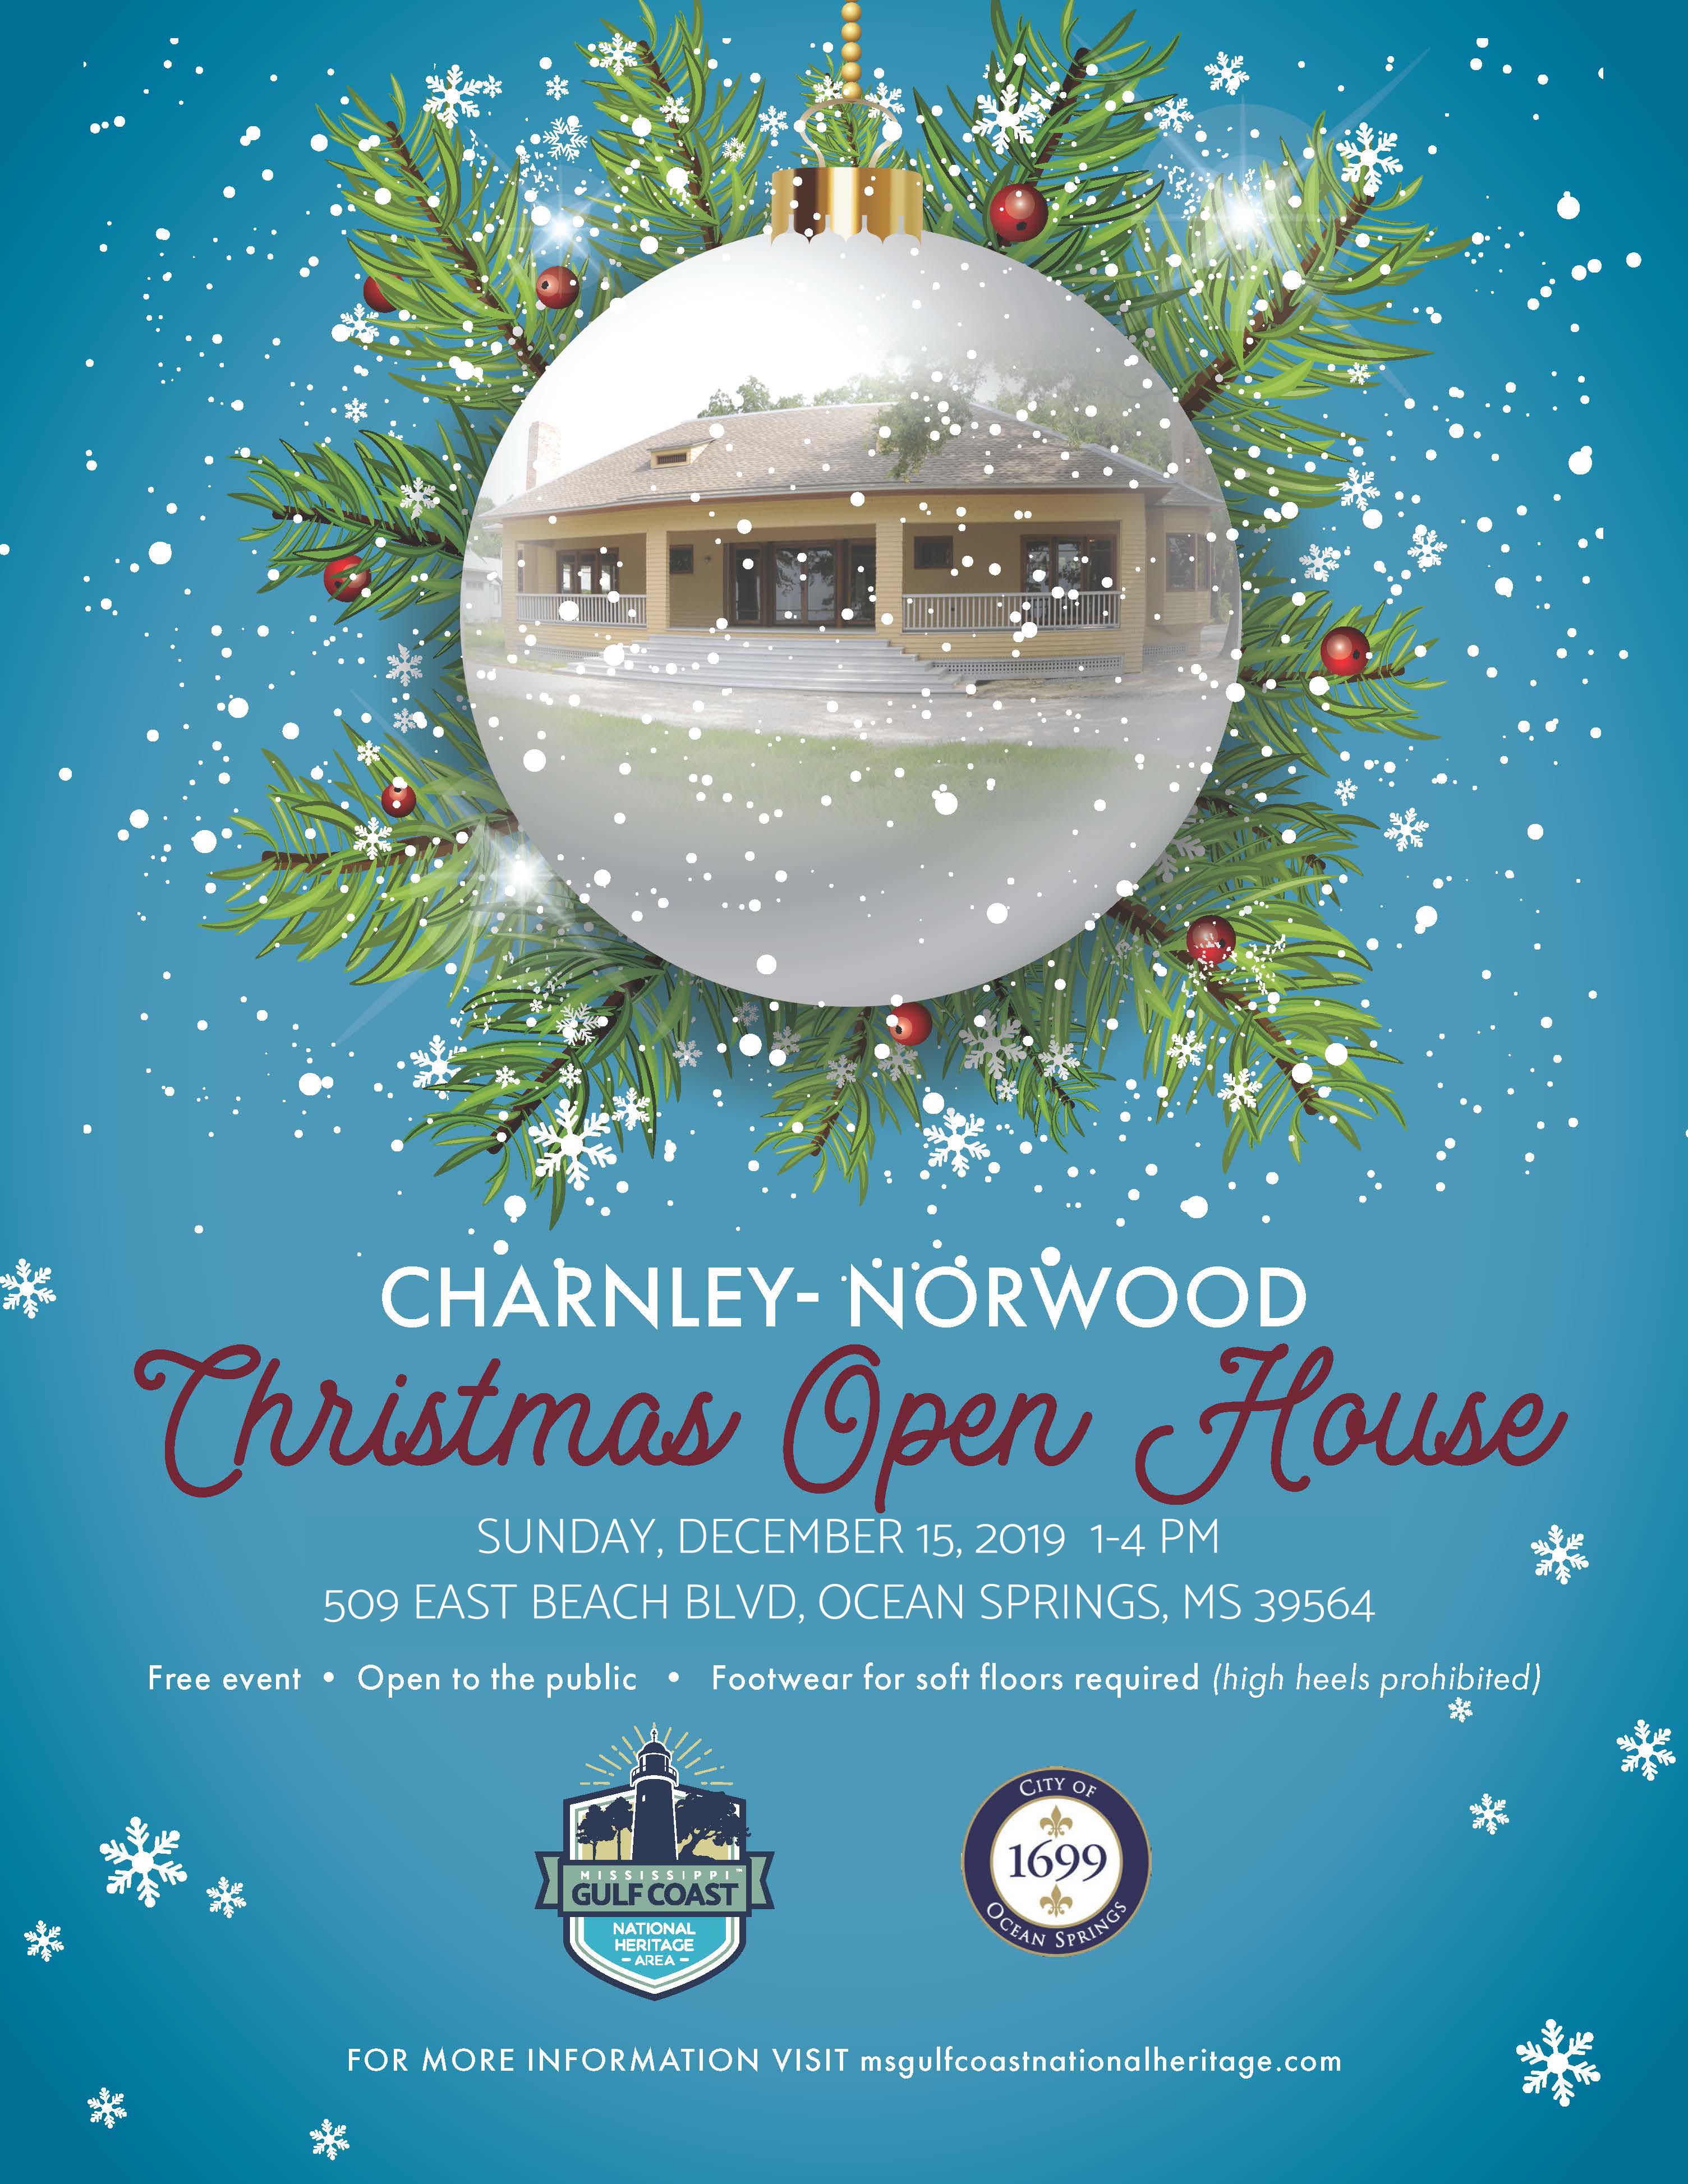 Charnley-Norwood Christmas Open House